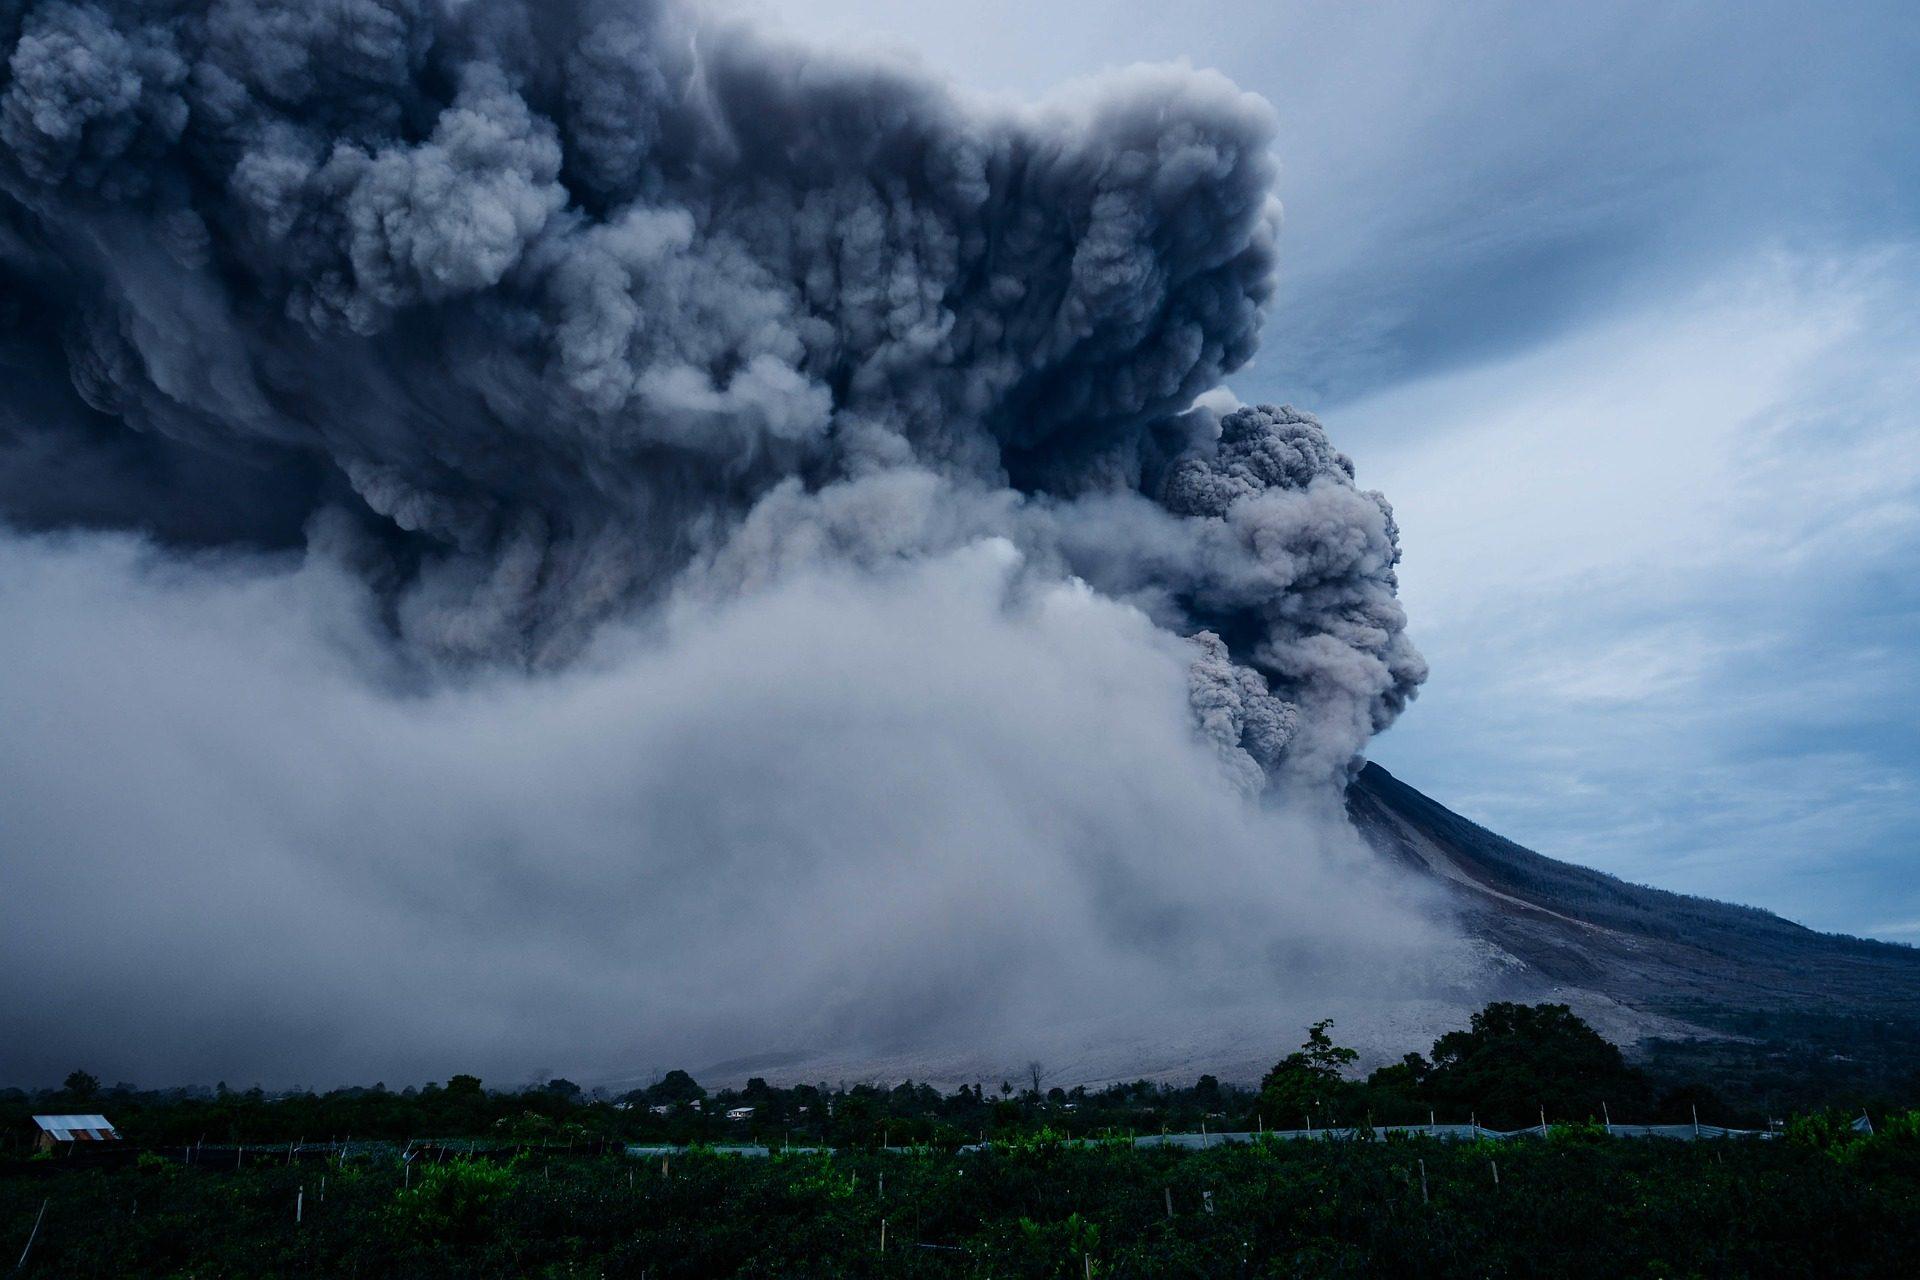 ज्वालामुखी, erupción, बादल, धुआँ, गैस - HD वॉलपेपर - प्रोफेसर-falken.com